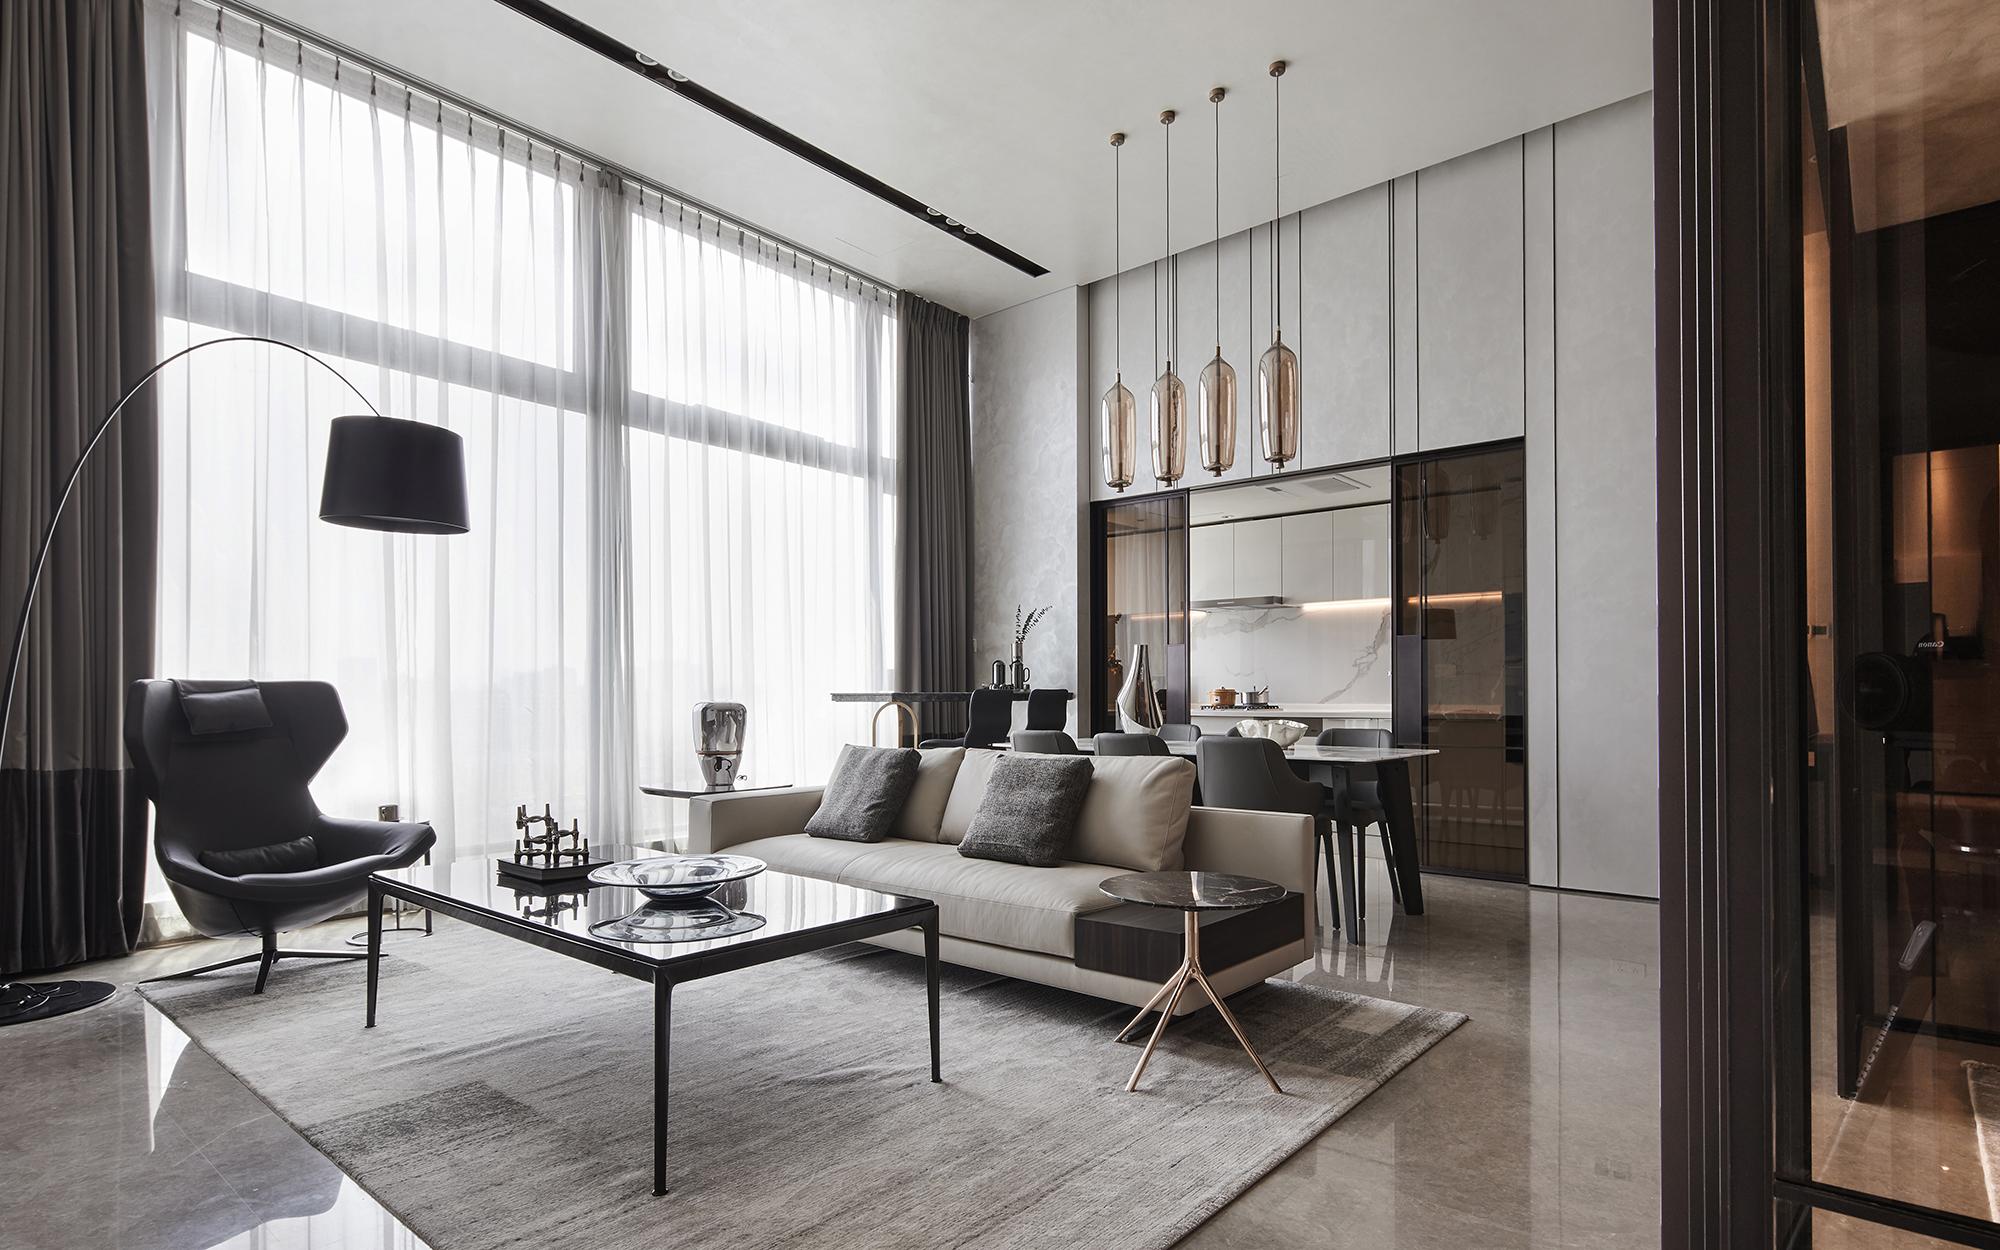 squarerooms GFD living room luxury home grey black white monochromatic minimalist modern tinted glass door